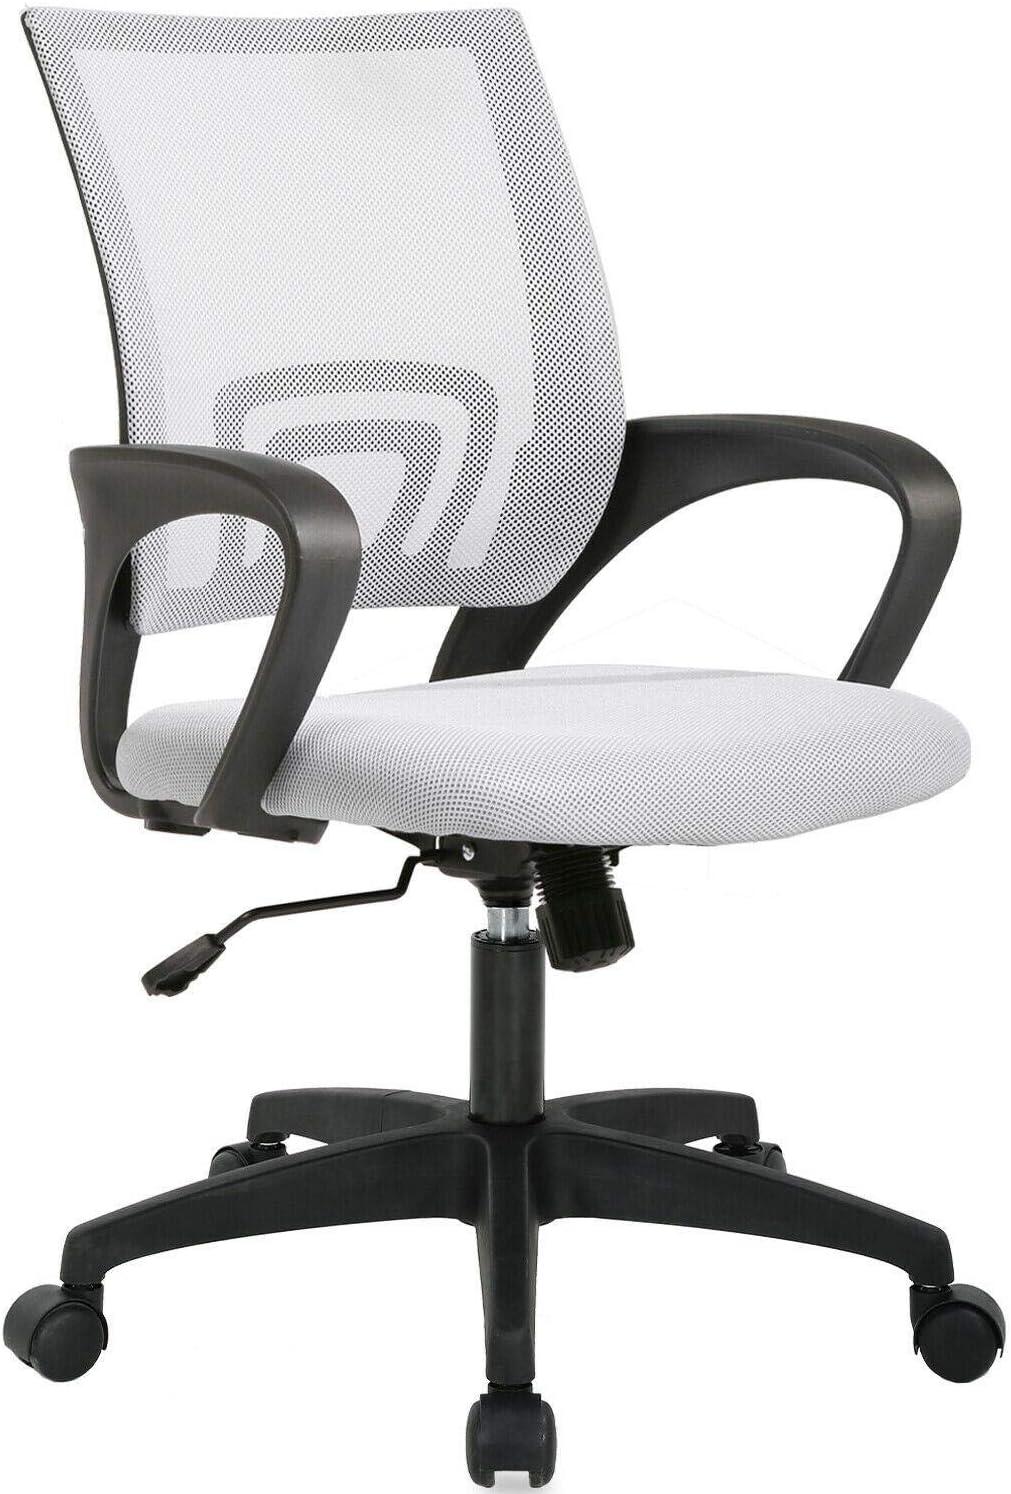 Home Office Chair Ergonomic cheap Computer Great interest Mesh Desk Home-